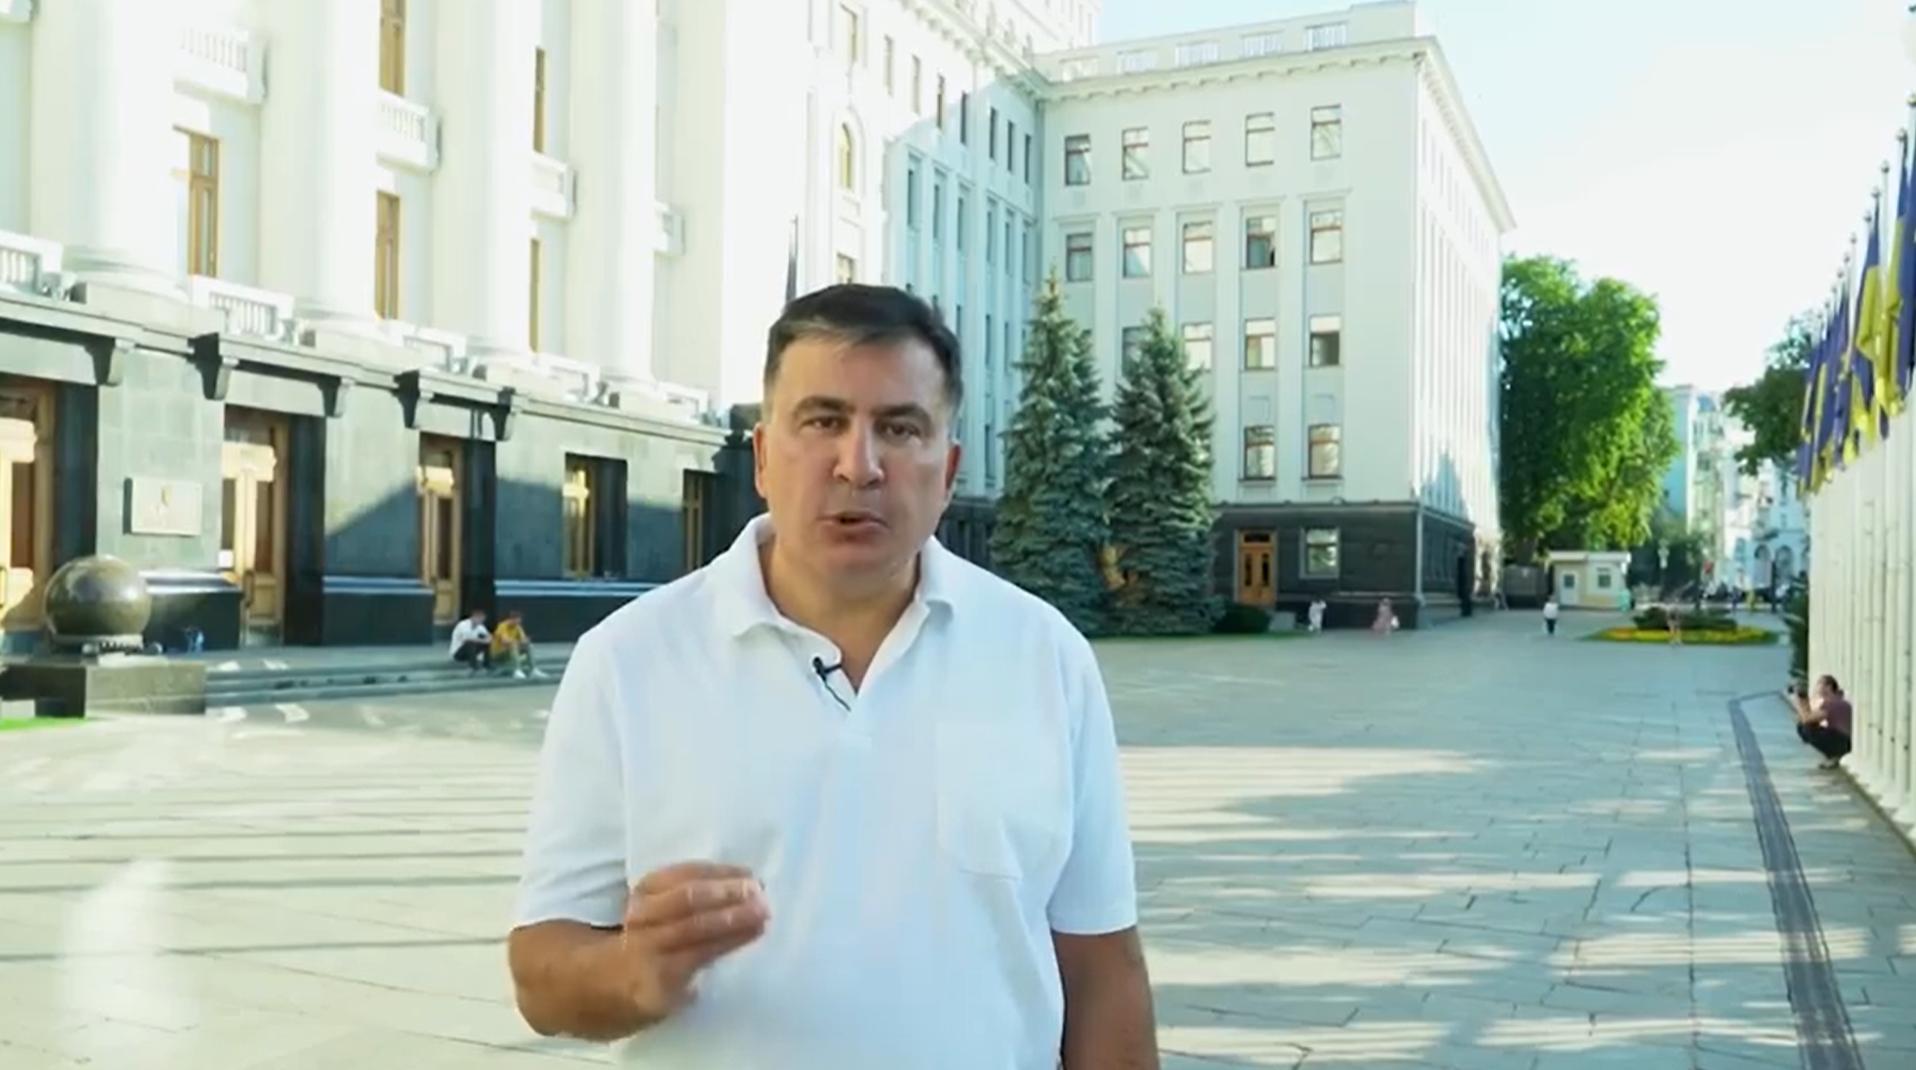 Mikheil Saakashvili #новости Выборы 2020, Михаил Саакашвили, третий президент, экс-президент